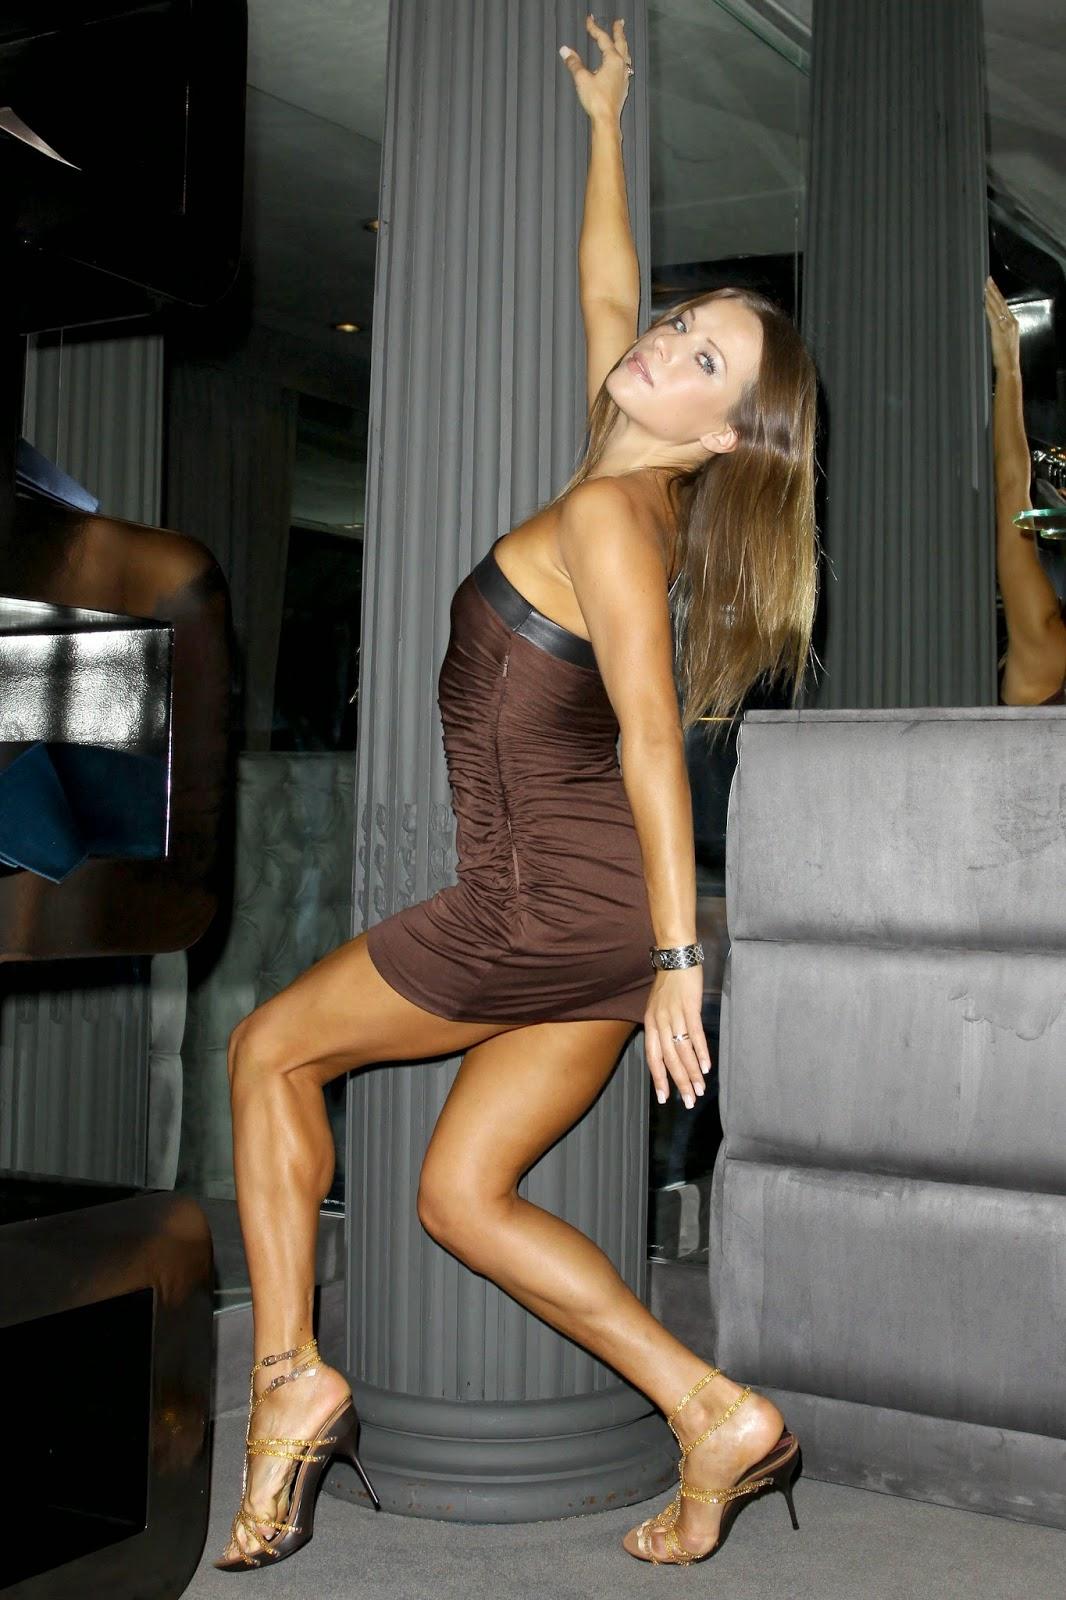 Her Calves Muscle Legs Edyta Sliwinska Muscular Calves